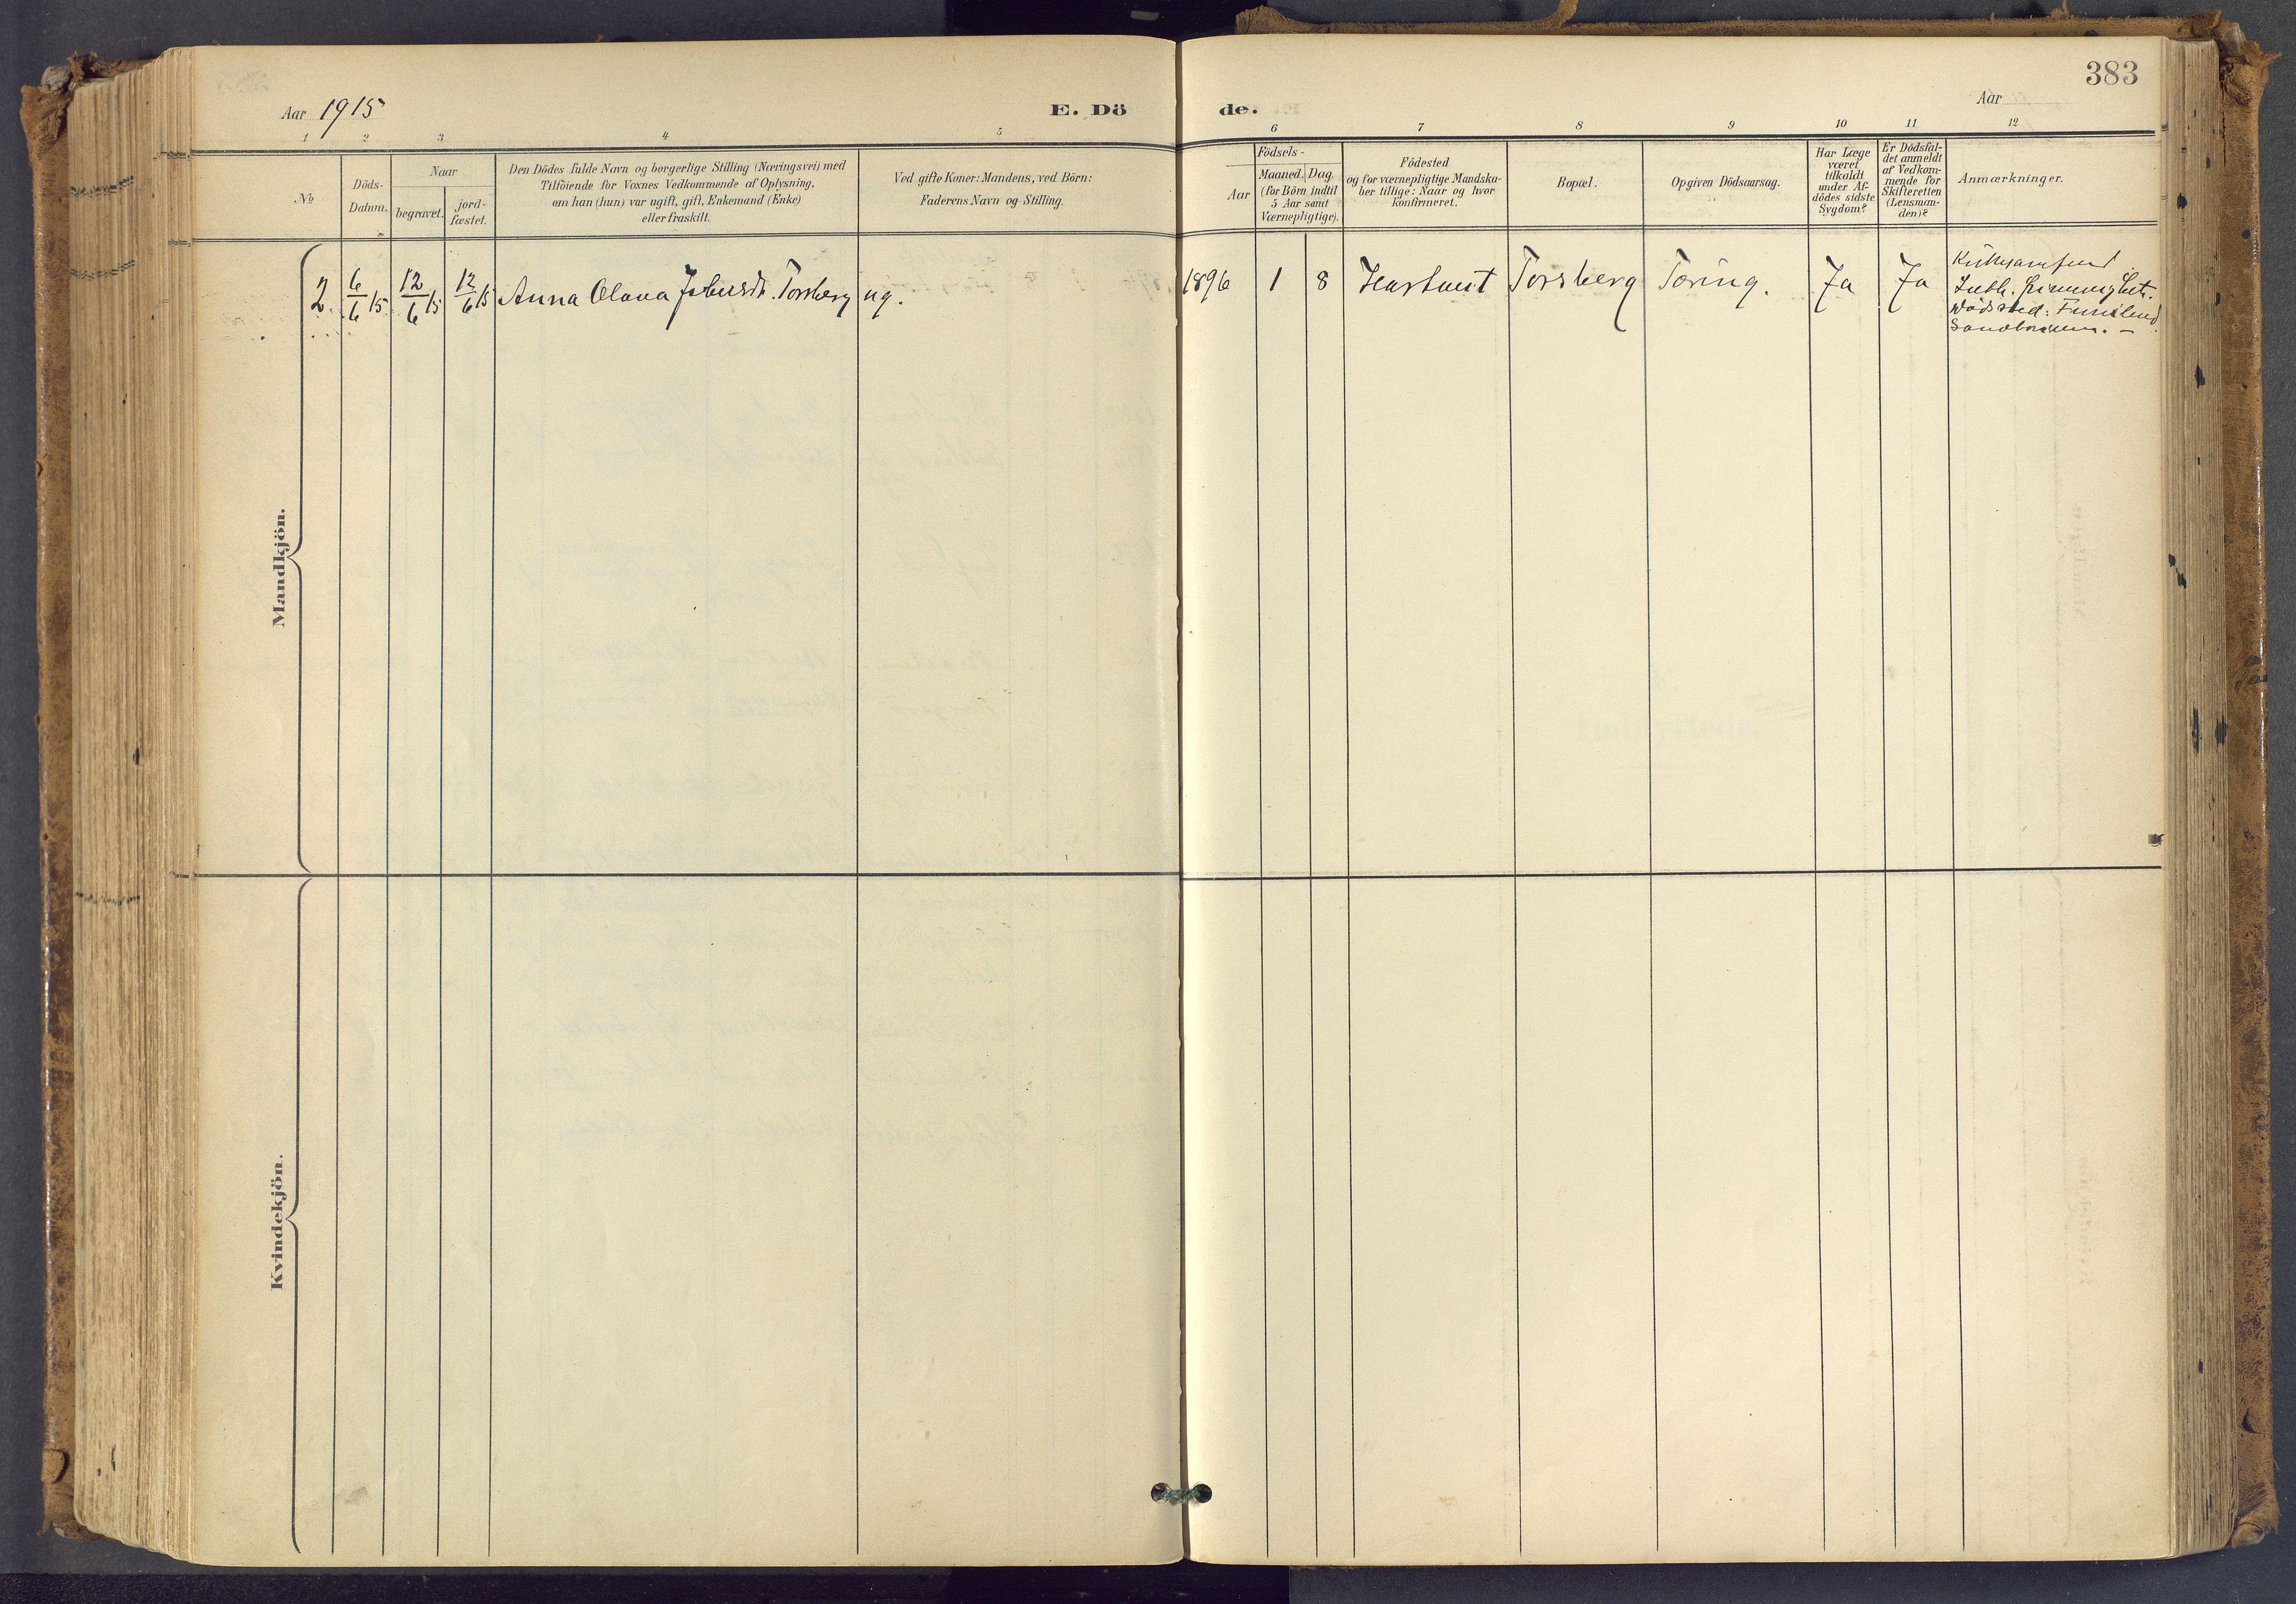 SAKO, Bamble kirkebøker, F/Fa/L0009: Ministerialbok nr. I 9, 1901-1917, s. 383